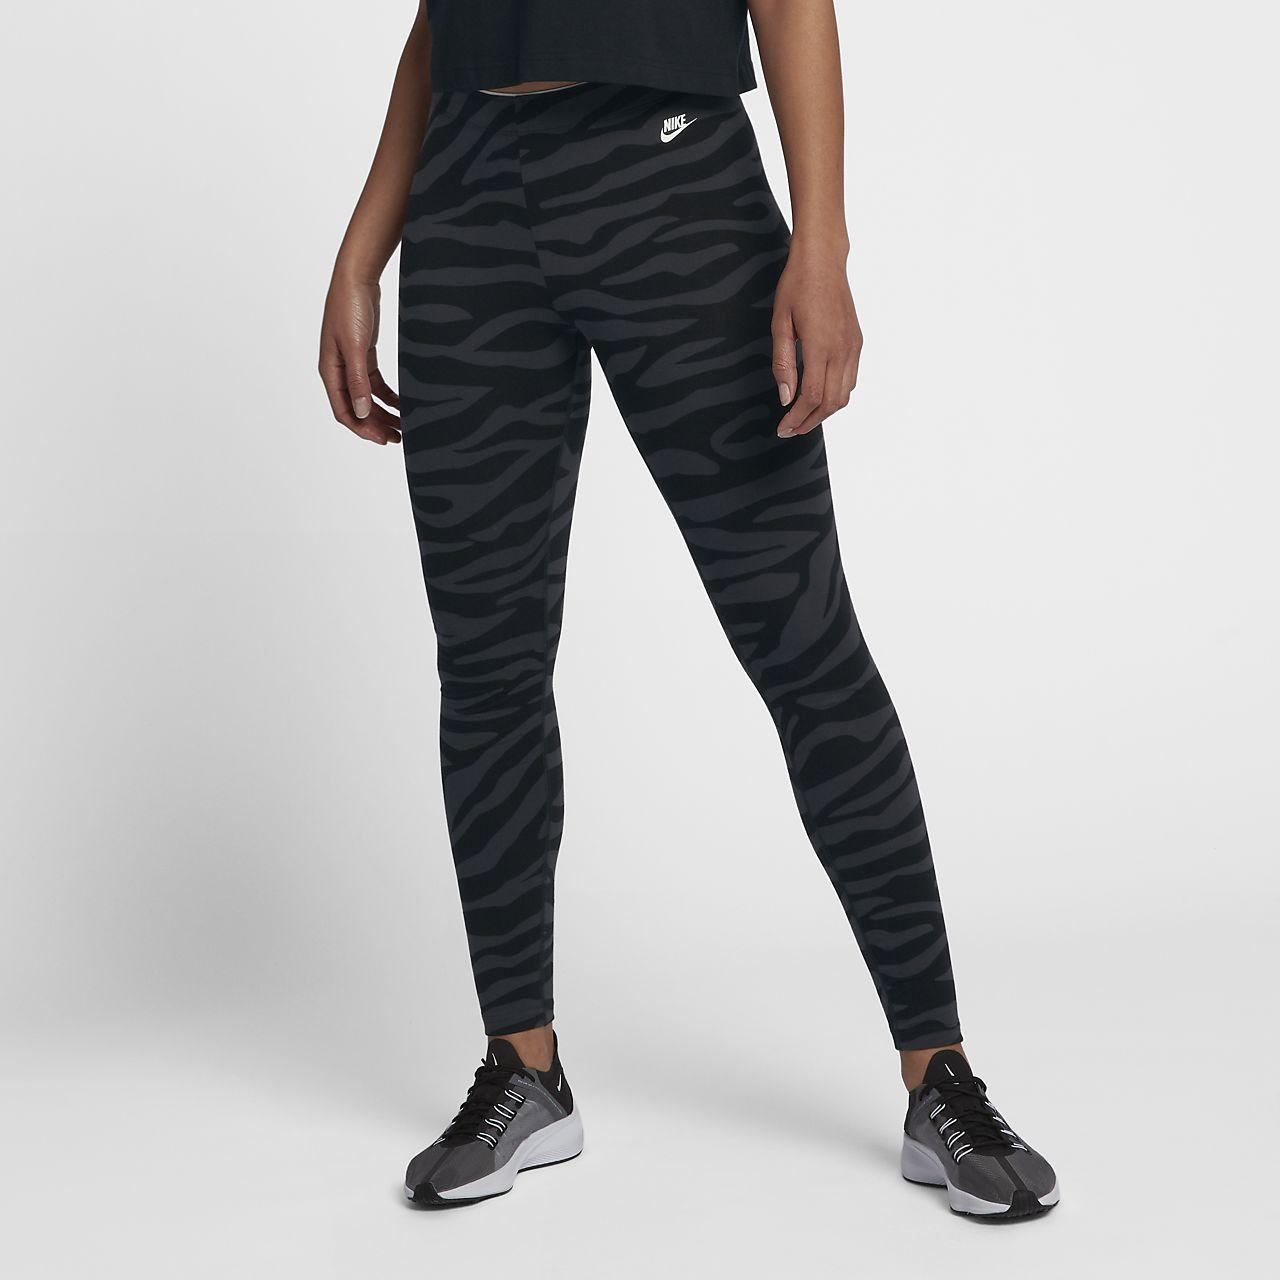 c9cfb9977279 Tight à imprimé animal Nike Sportswear Club pour Femme. Nike.com MA